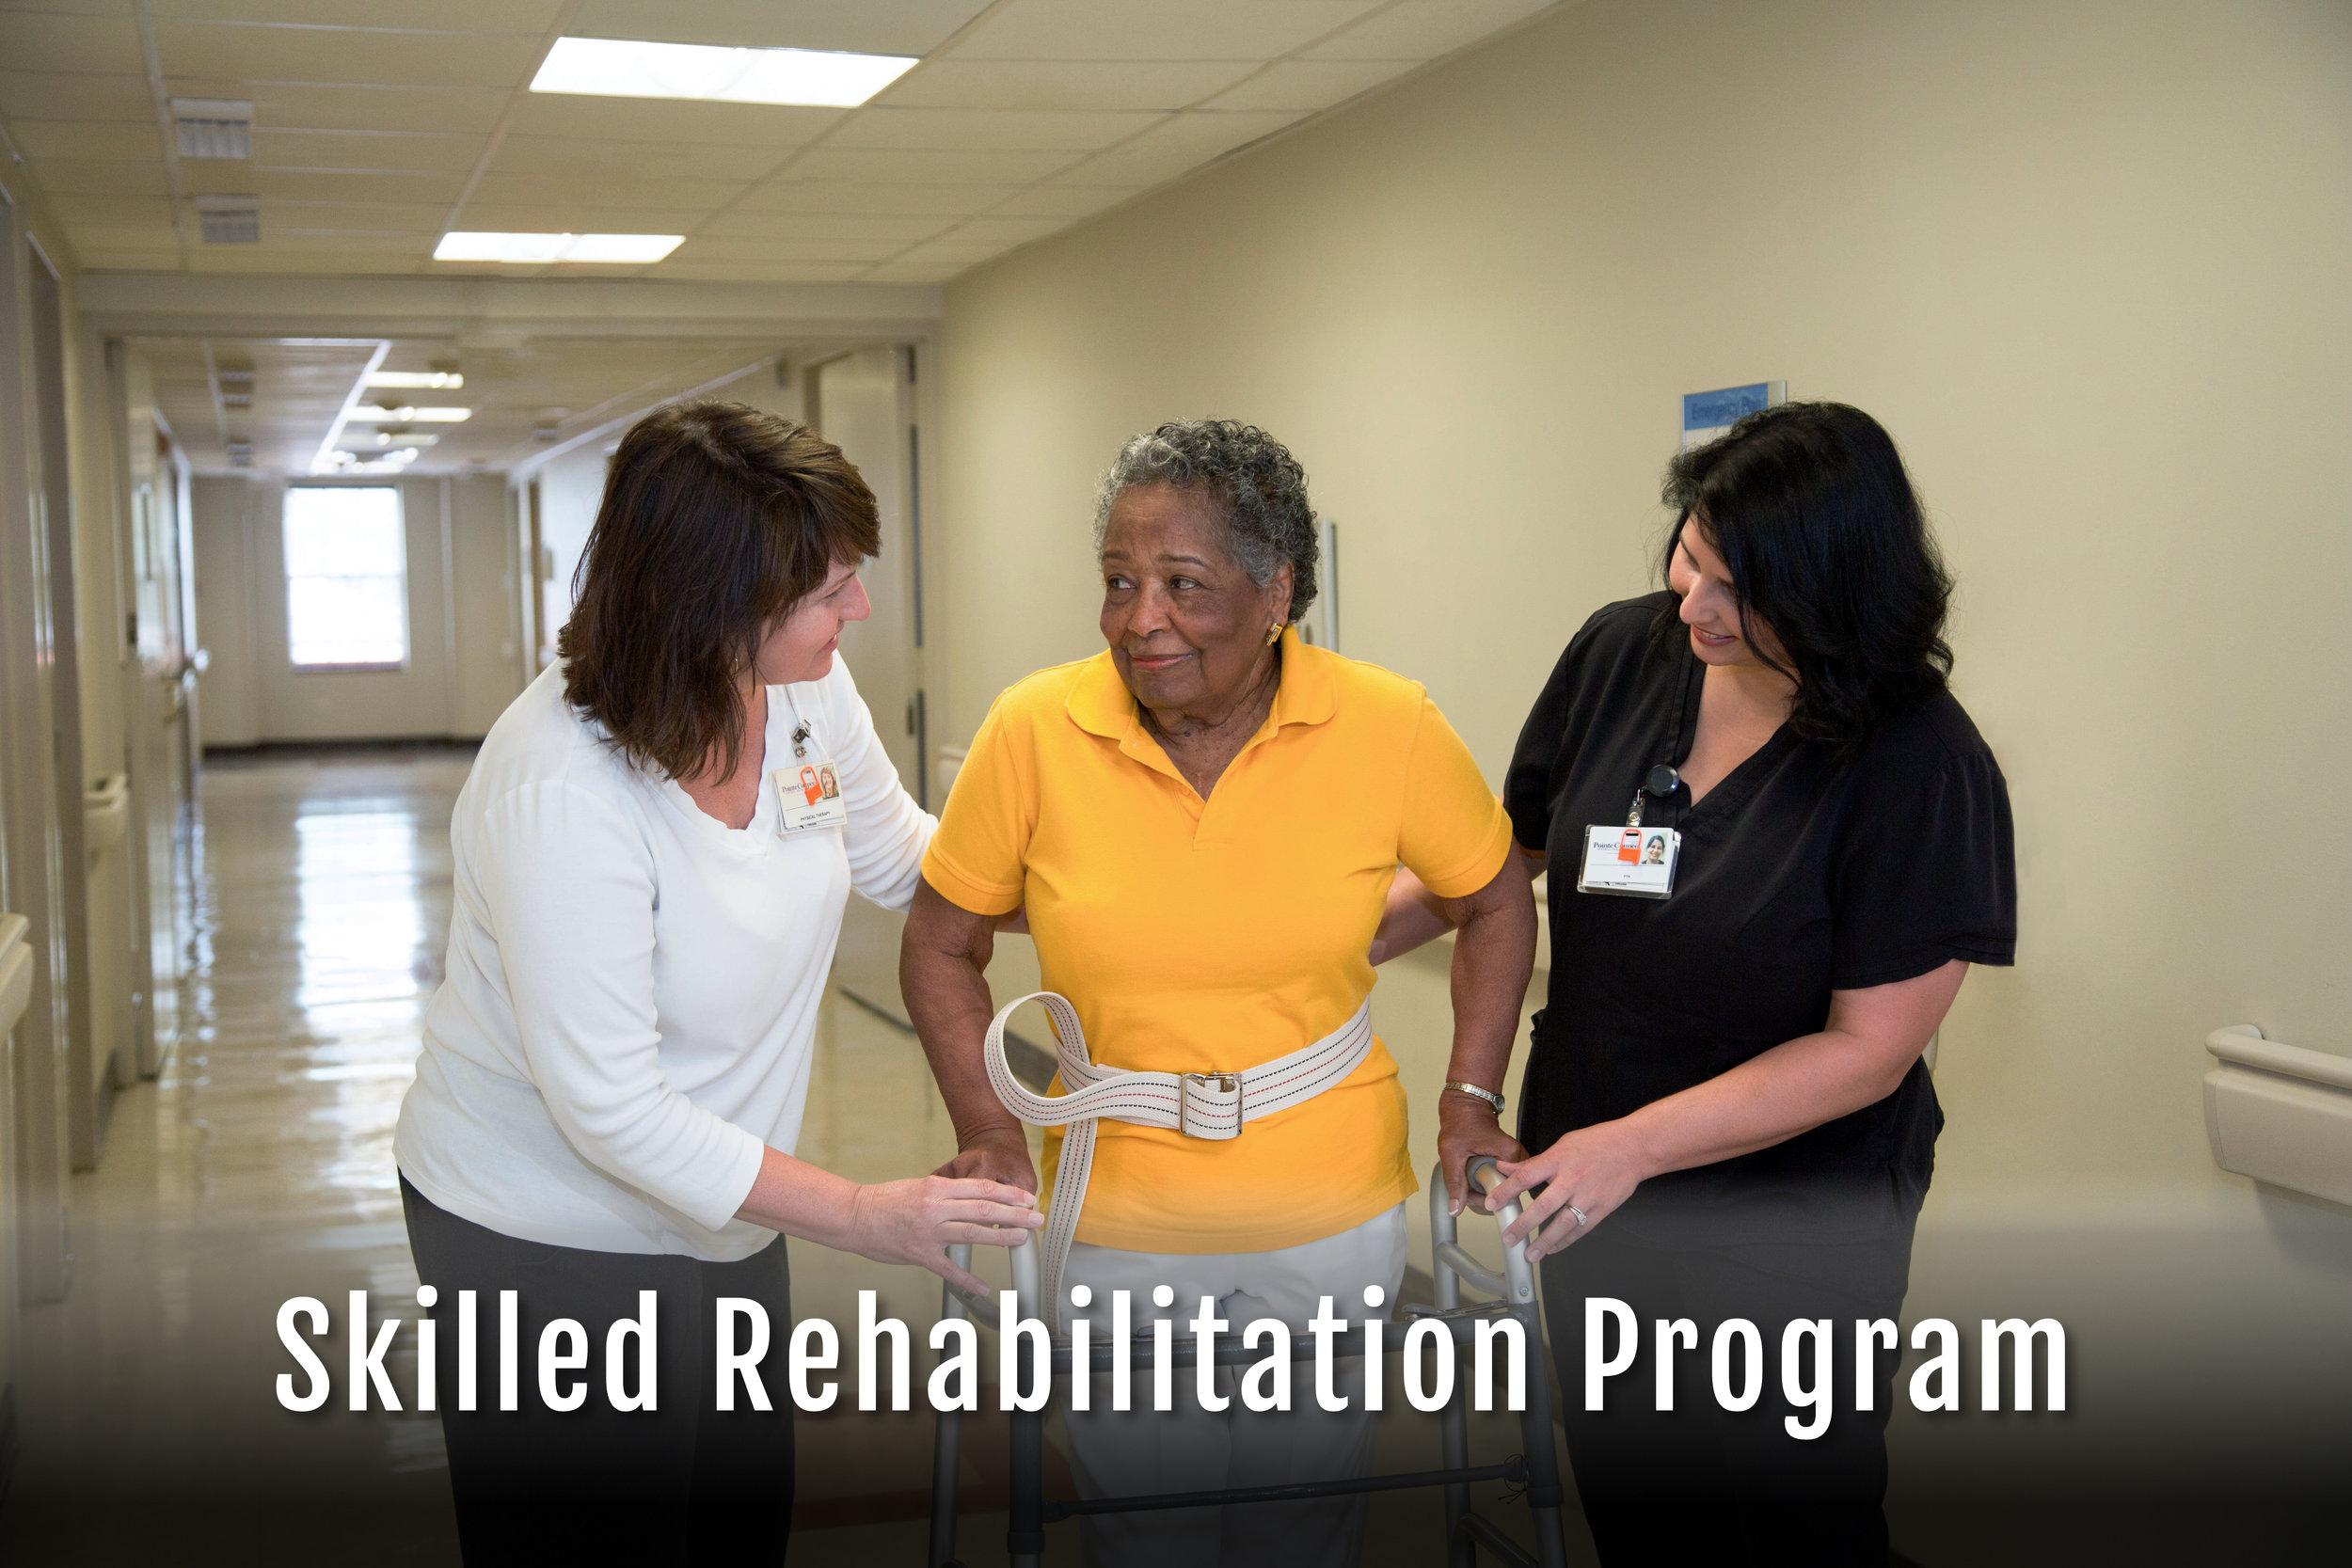 5, Skilled Rehabilitation Program.jpg